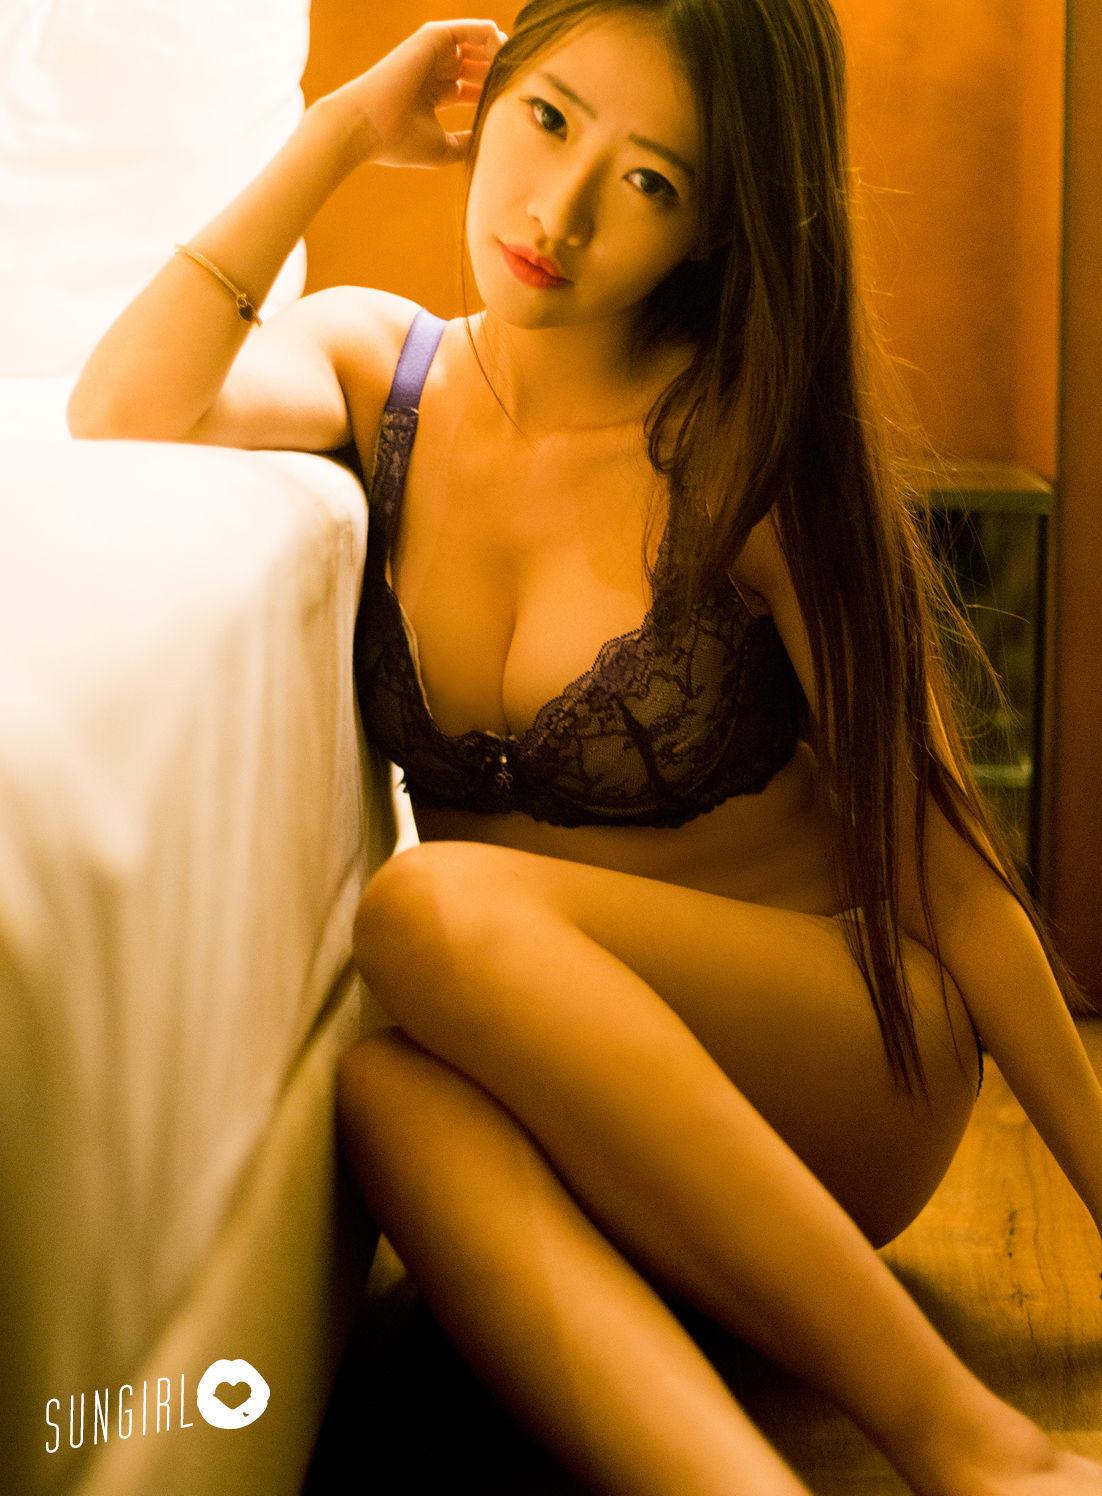 4CJOD-060夜店女王气质慵懒迷人又骚又媚的美女性感写真